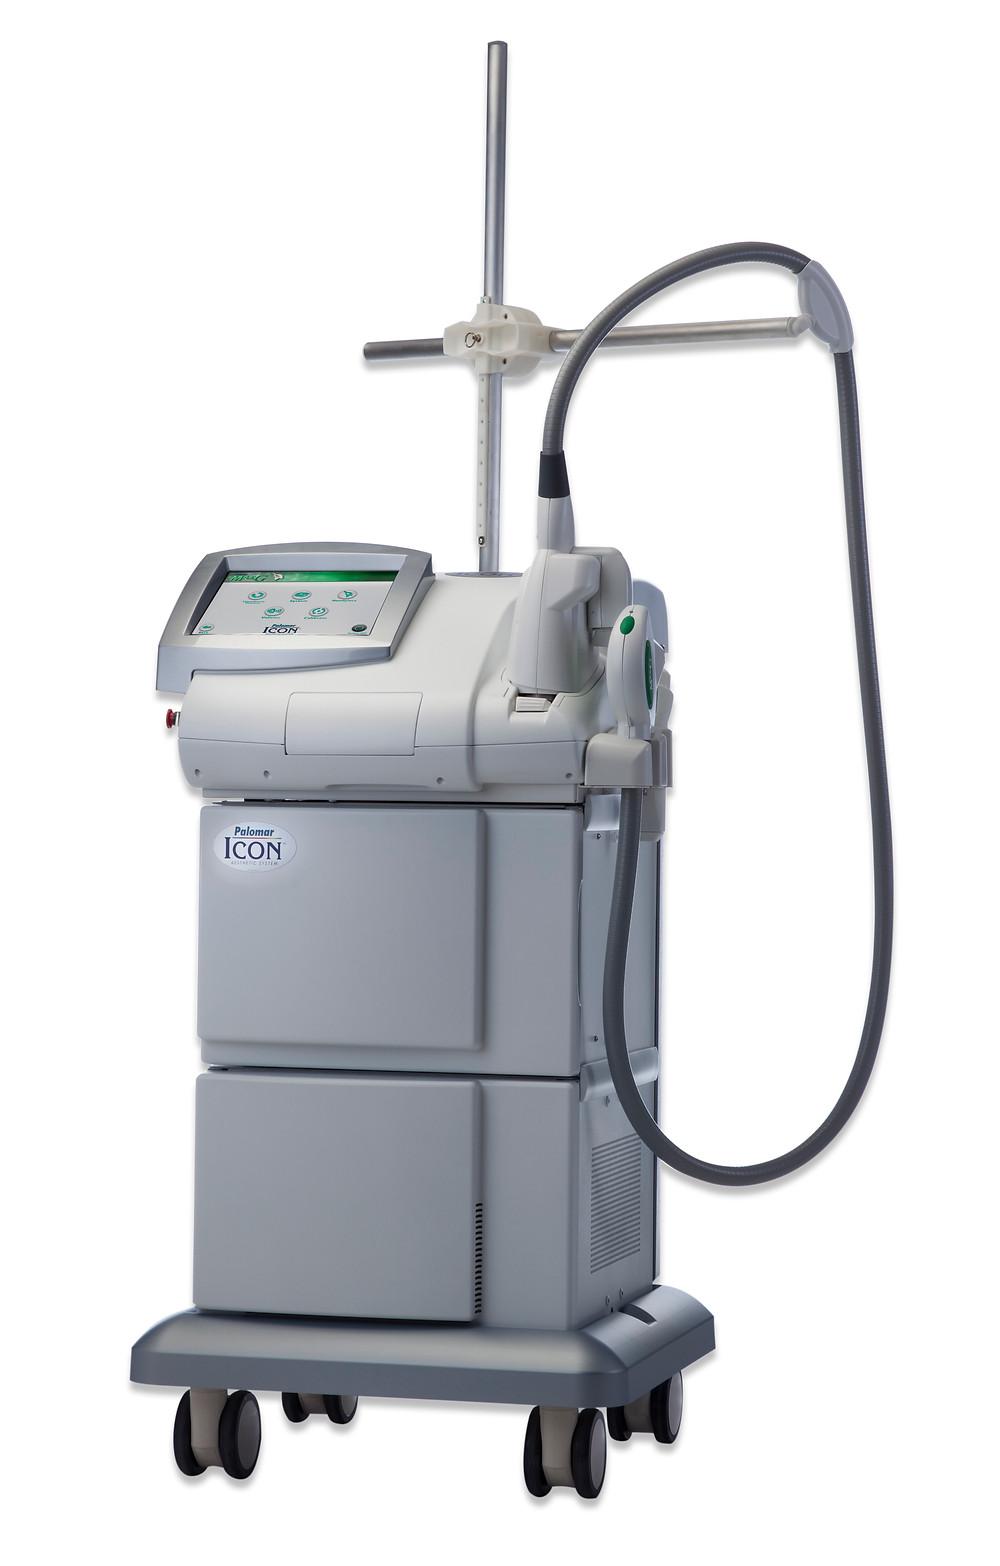 ICON Laser System